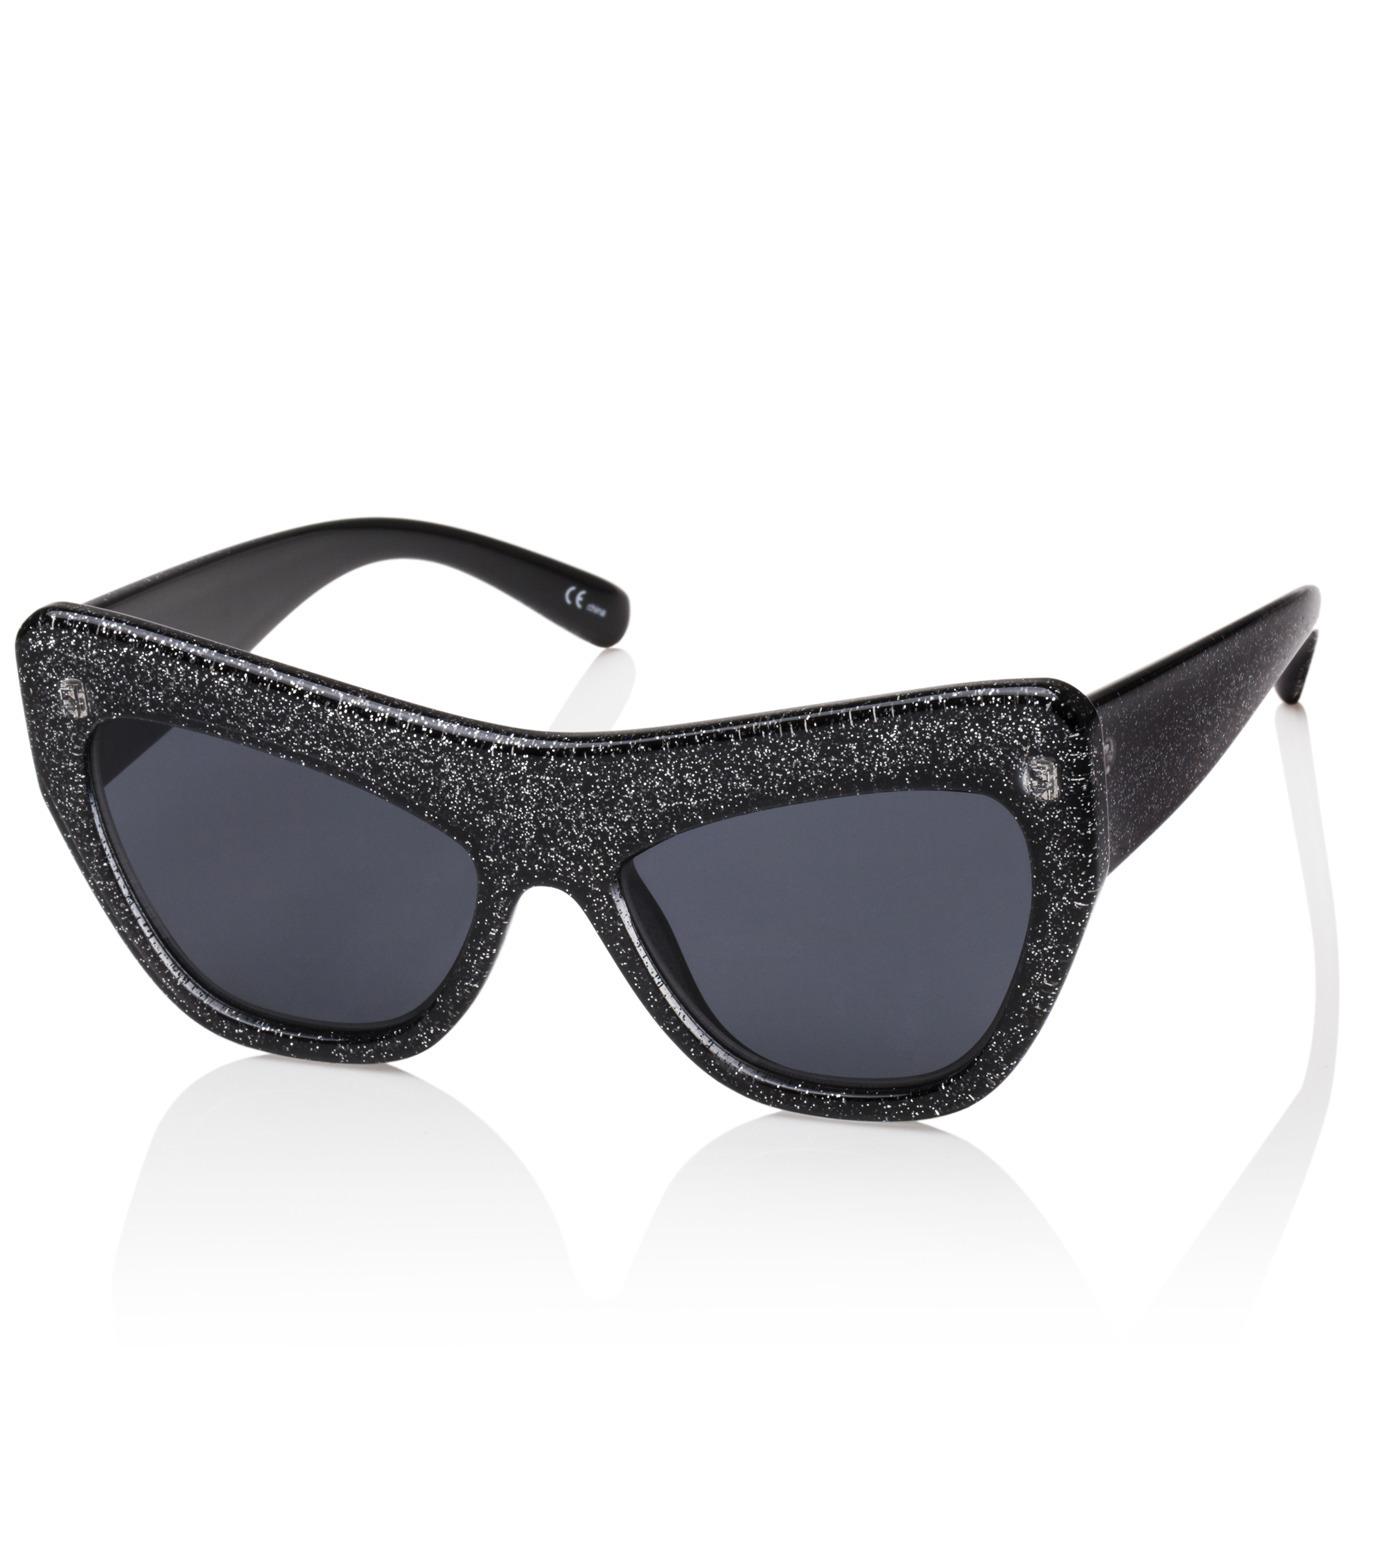 Adam Selman×Le Specs(アダム・セルマン×ル・スペックス)のPlaygirl -Black Glitter / Smoke Mono--GUNMETAL(アイウェア/eyewear)-1502065-6 拡大詳細画像1